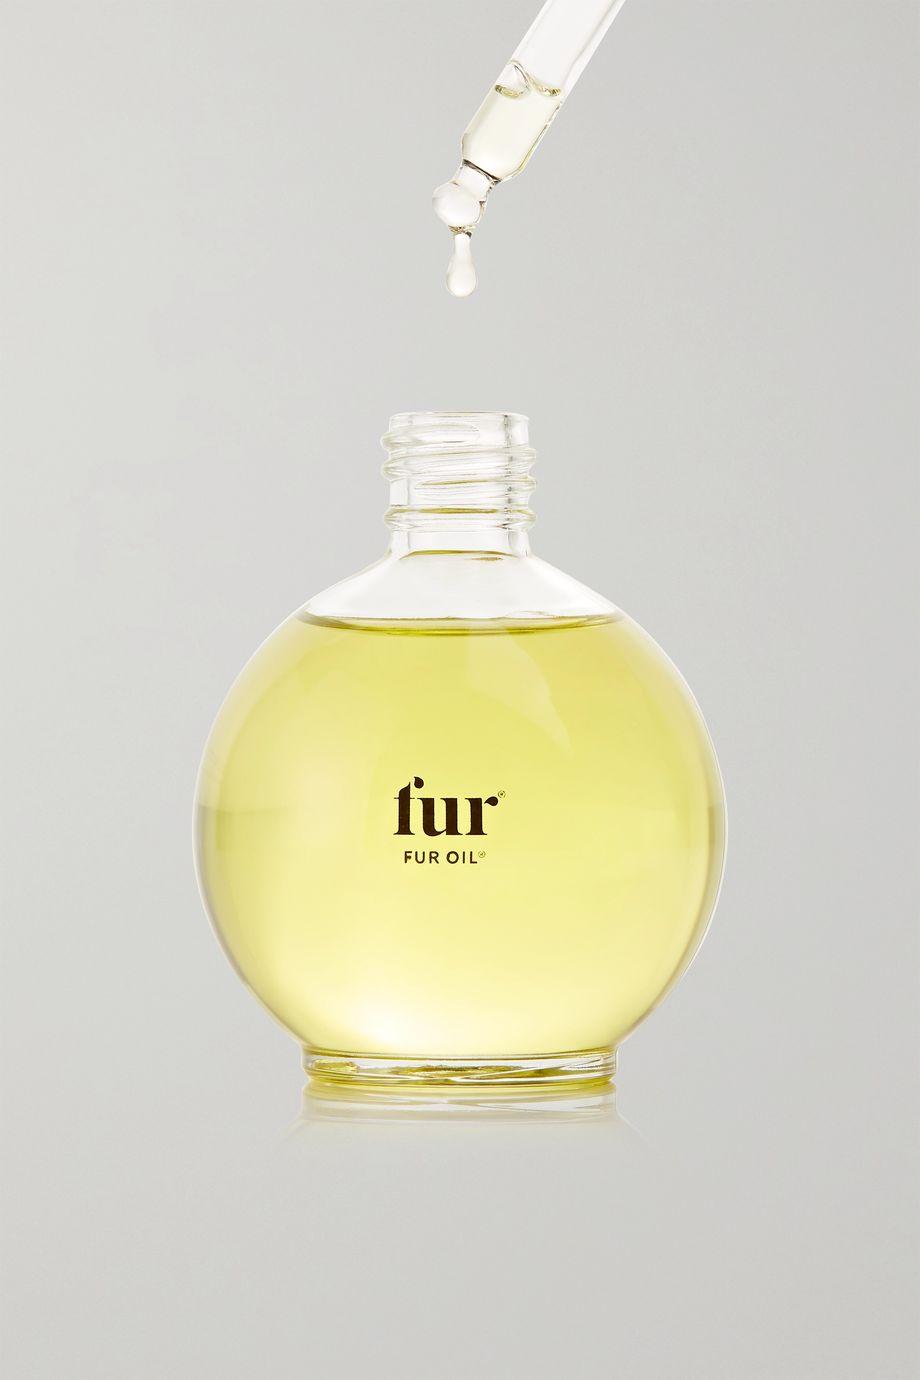 FUR Fur Oil, 75 ml – Intimpflegeöl